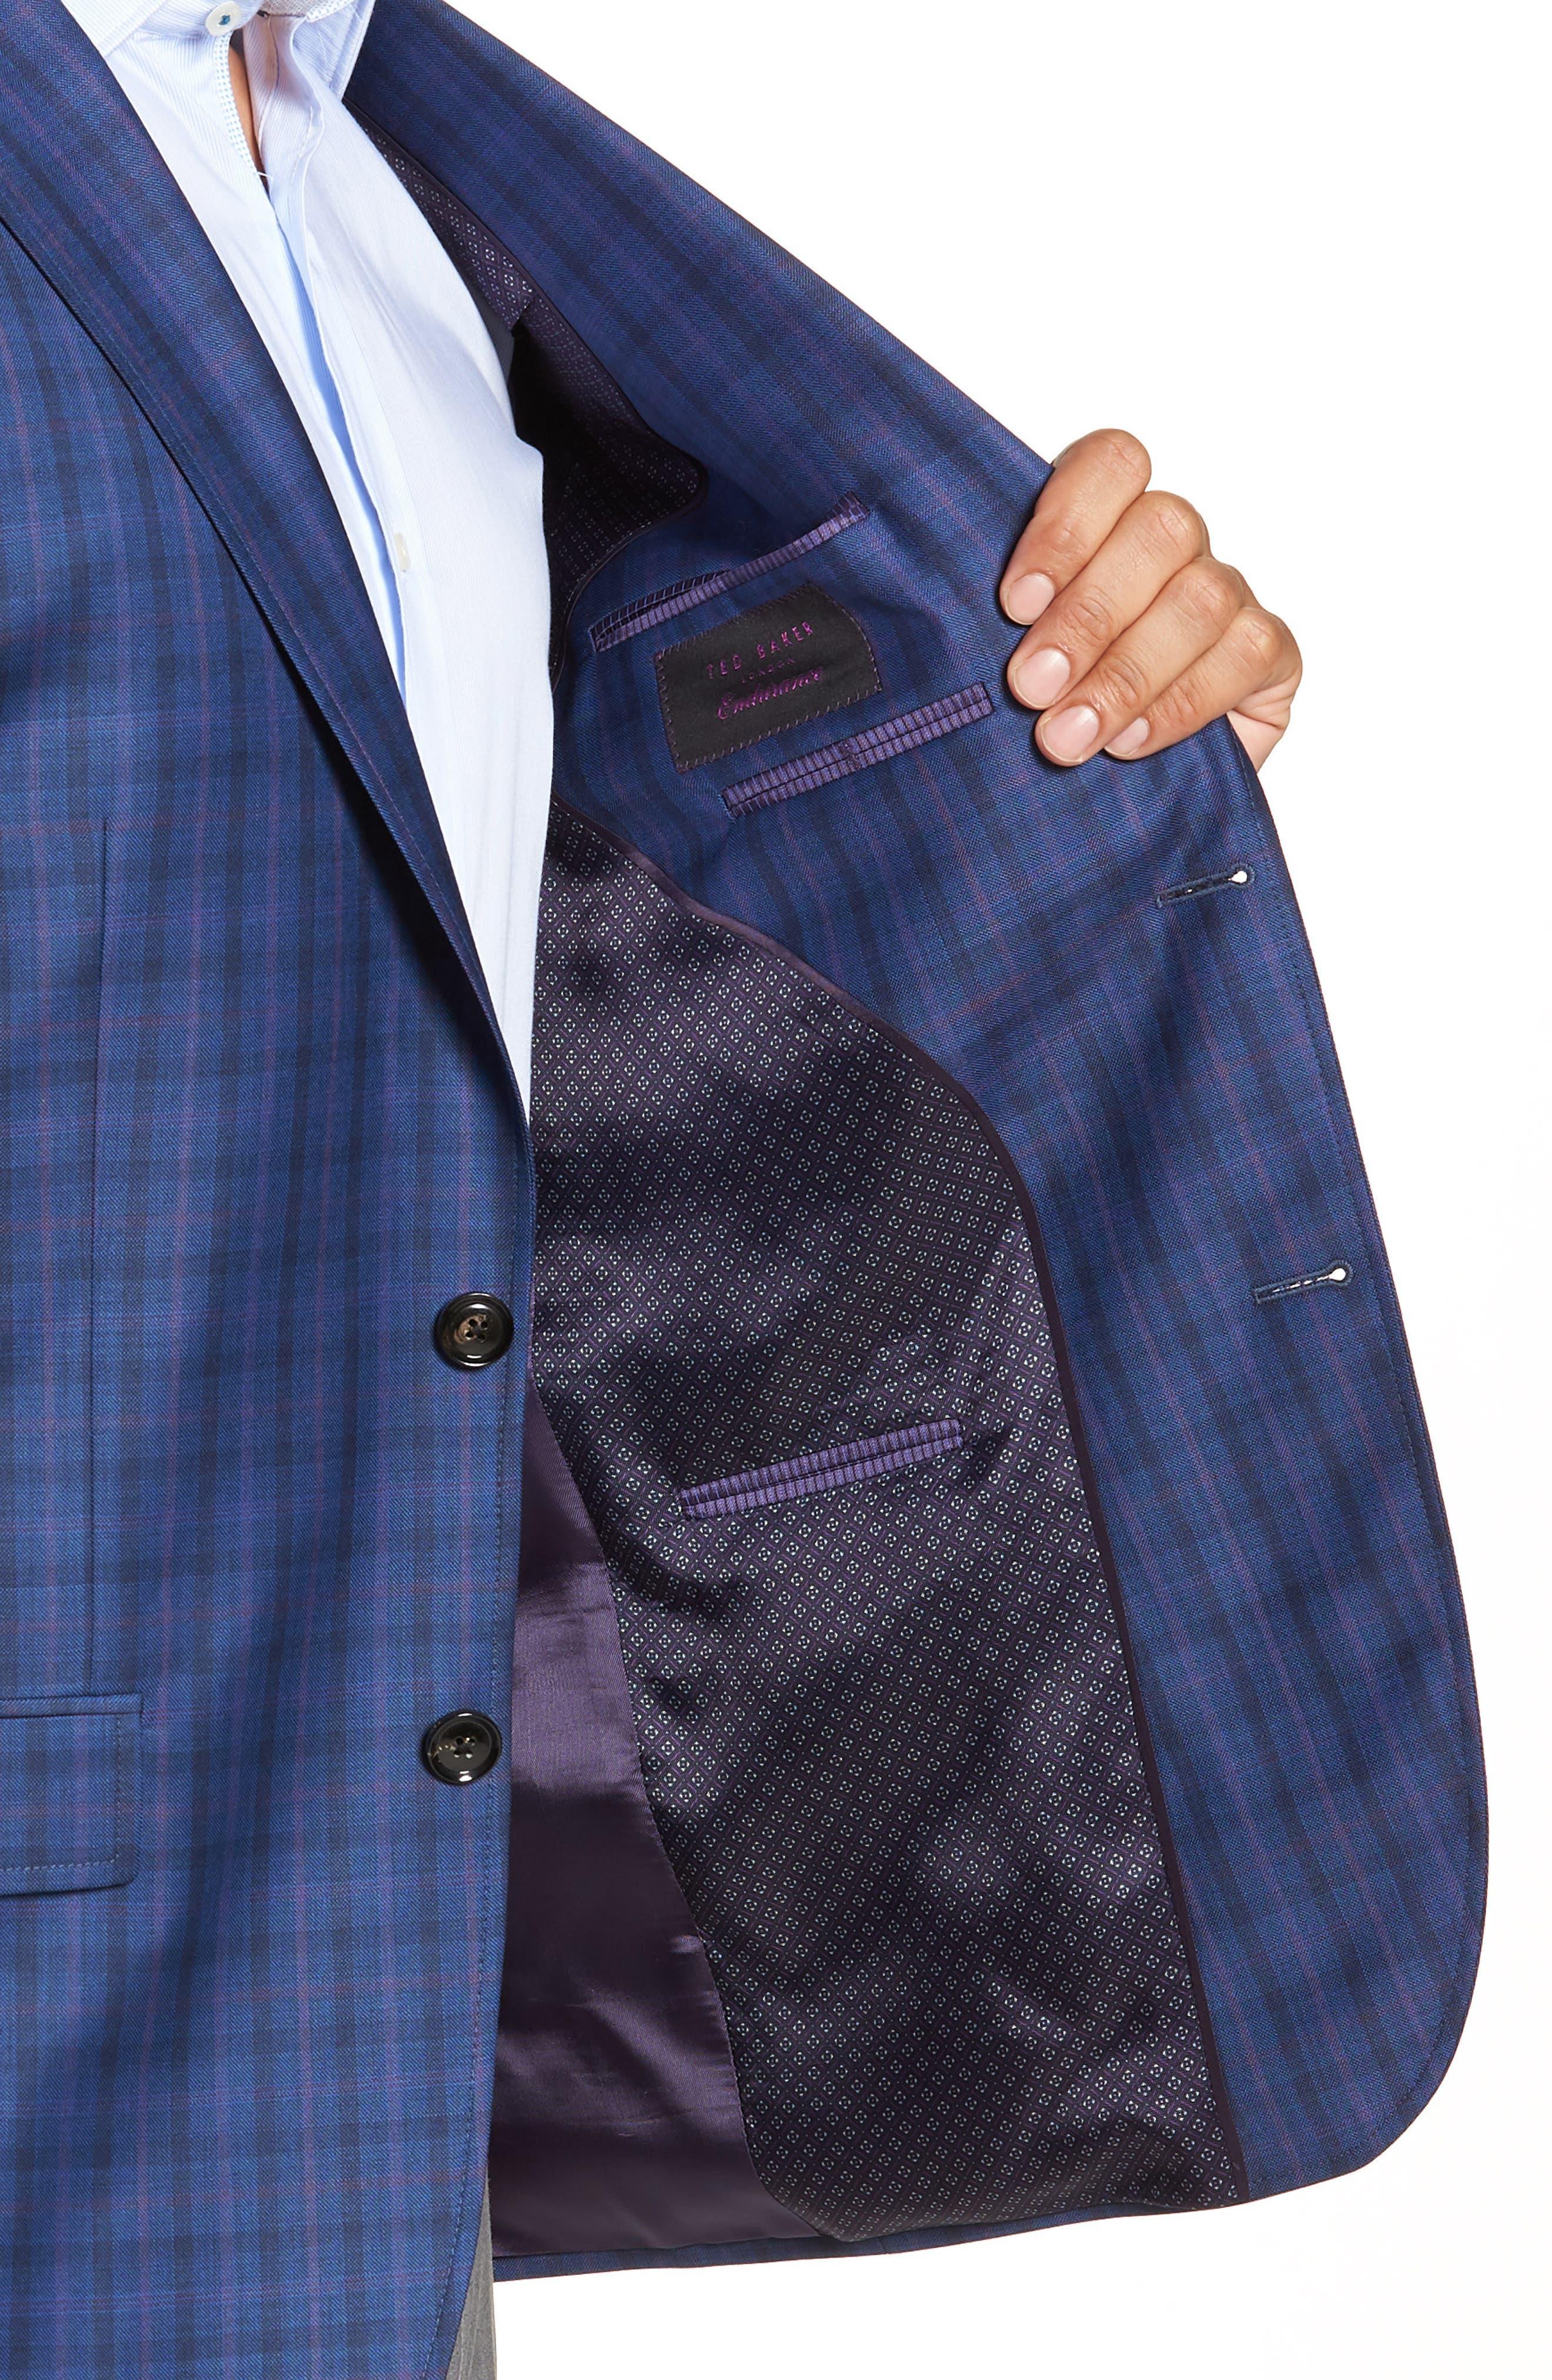 Jay Trim Fit Windowpane Wool Sport Coat,                             Alternate thumbnail 4, color,                             Blue